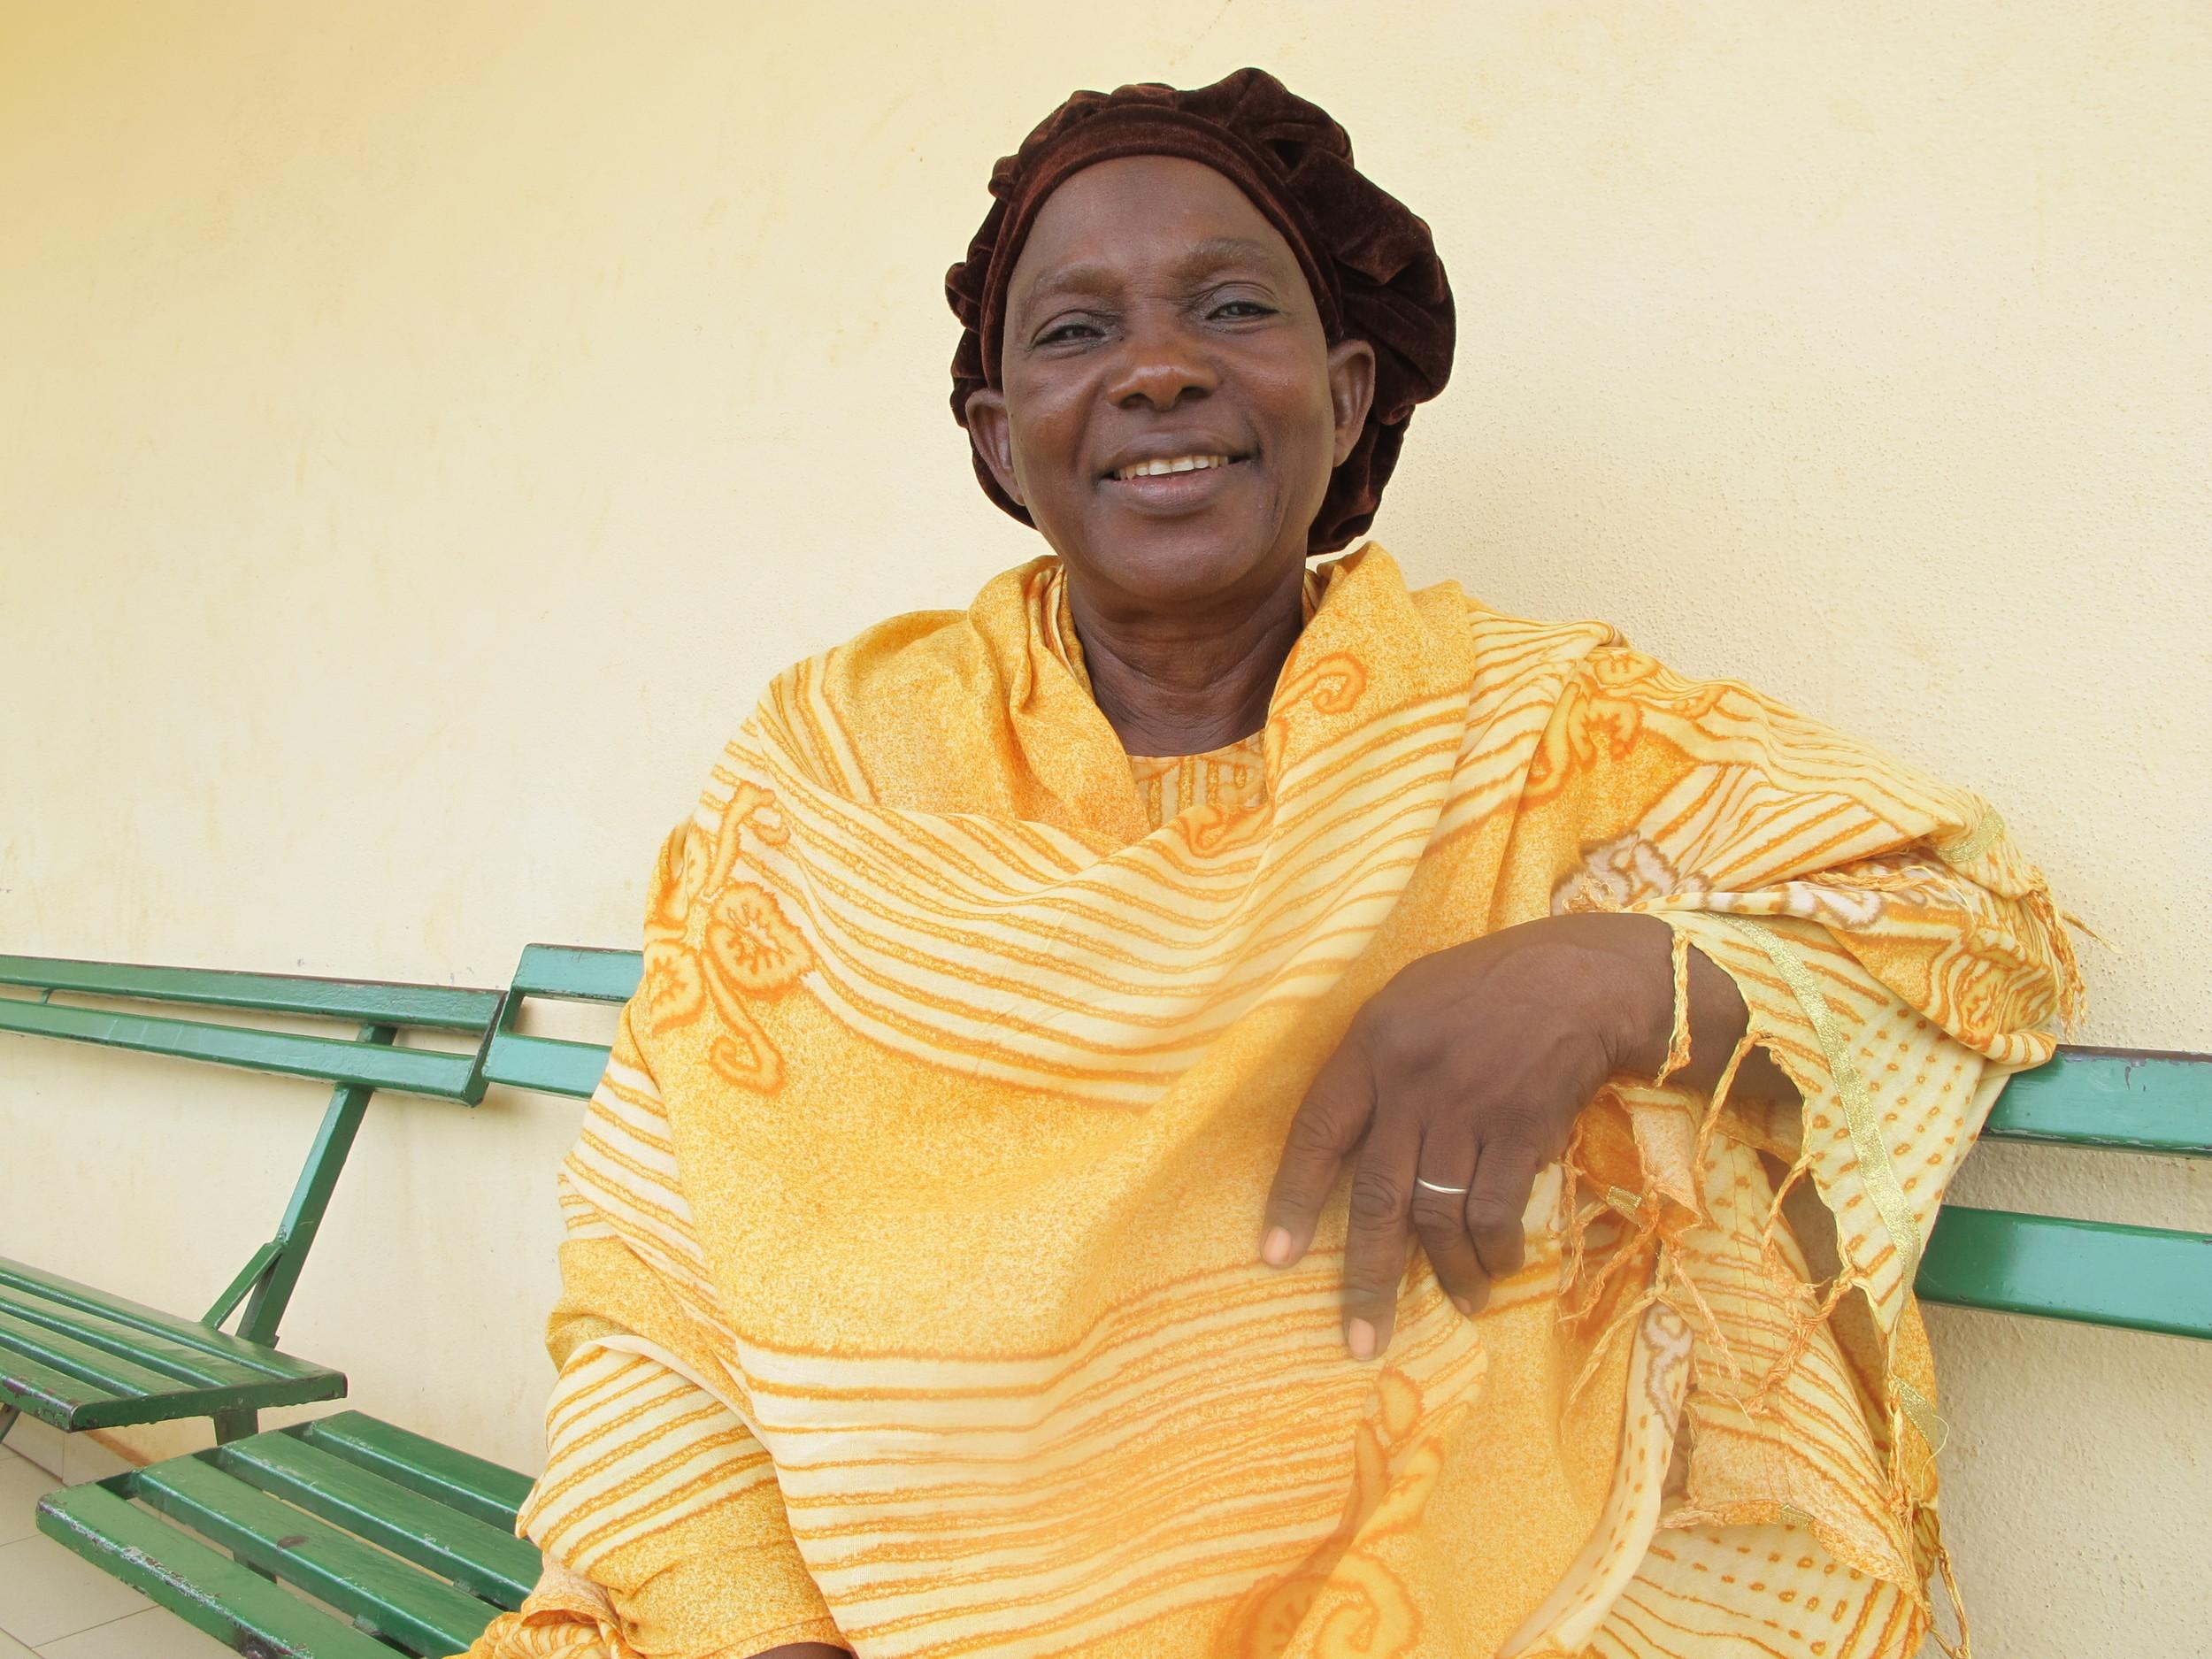 Mme Sabané Rokia Sangare,Vice President of ASACOMSI